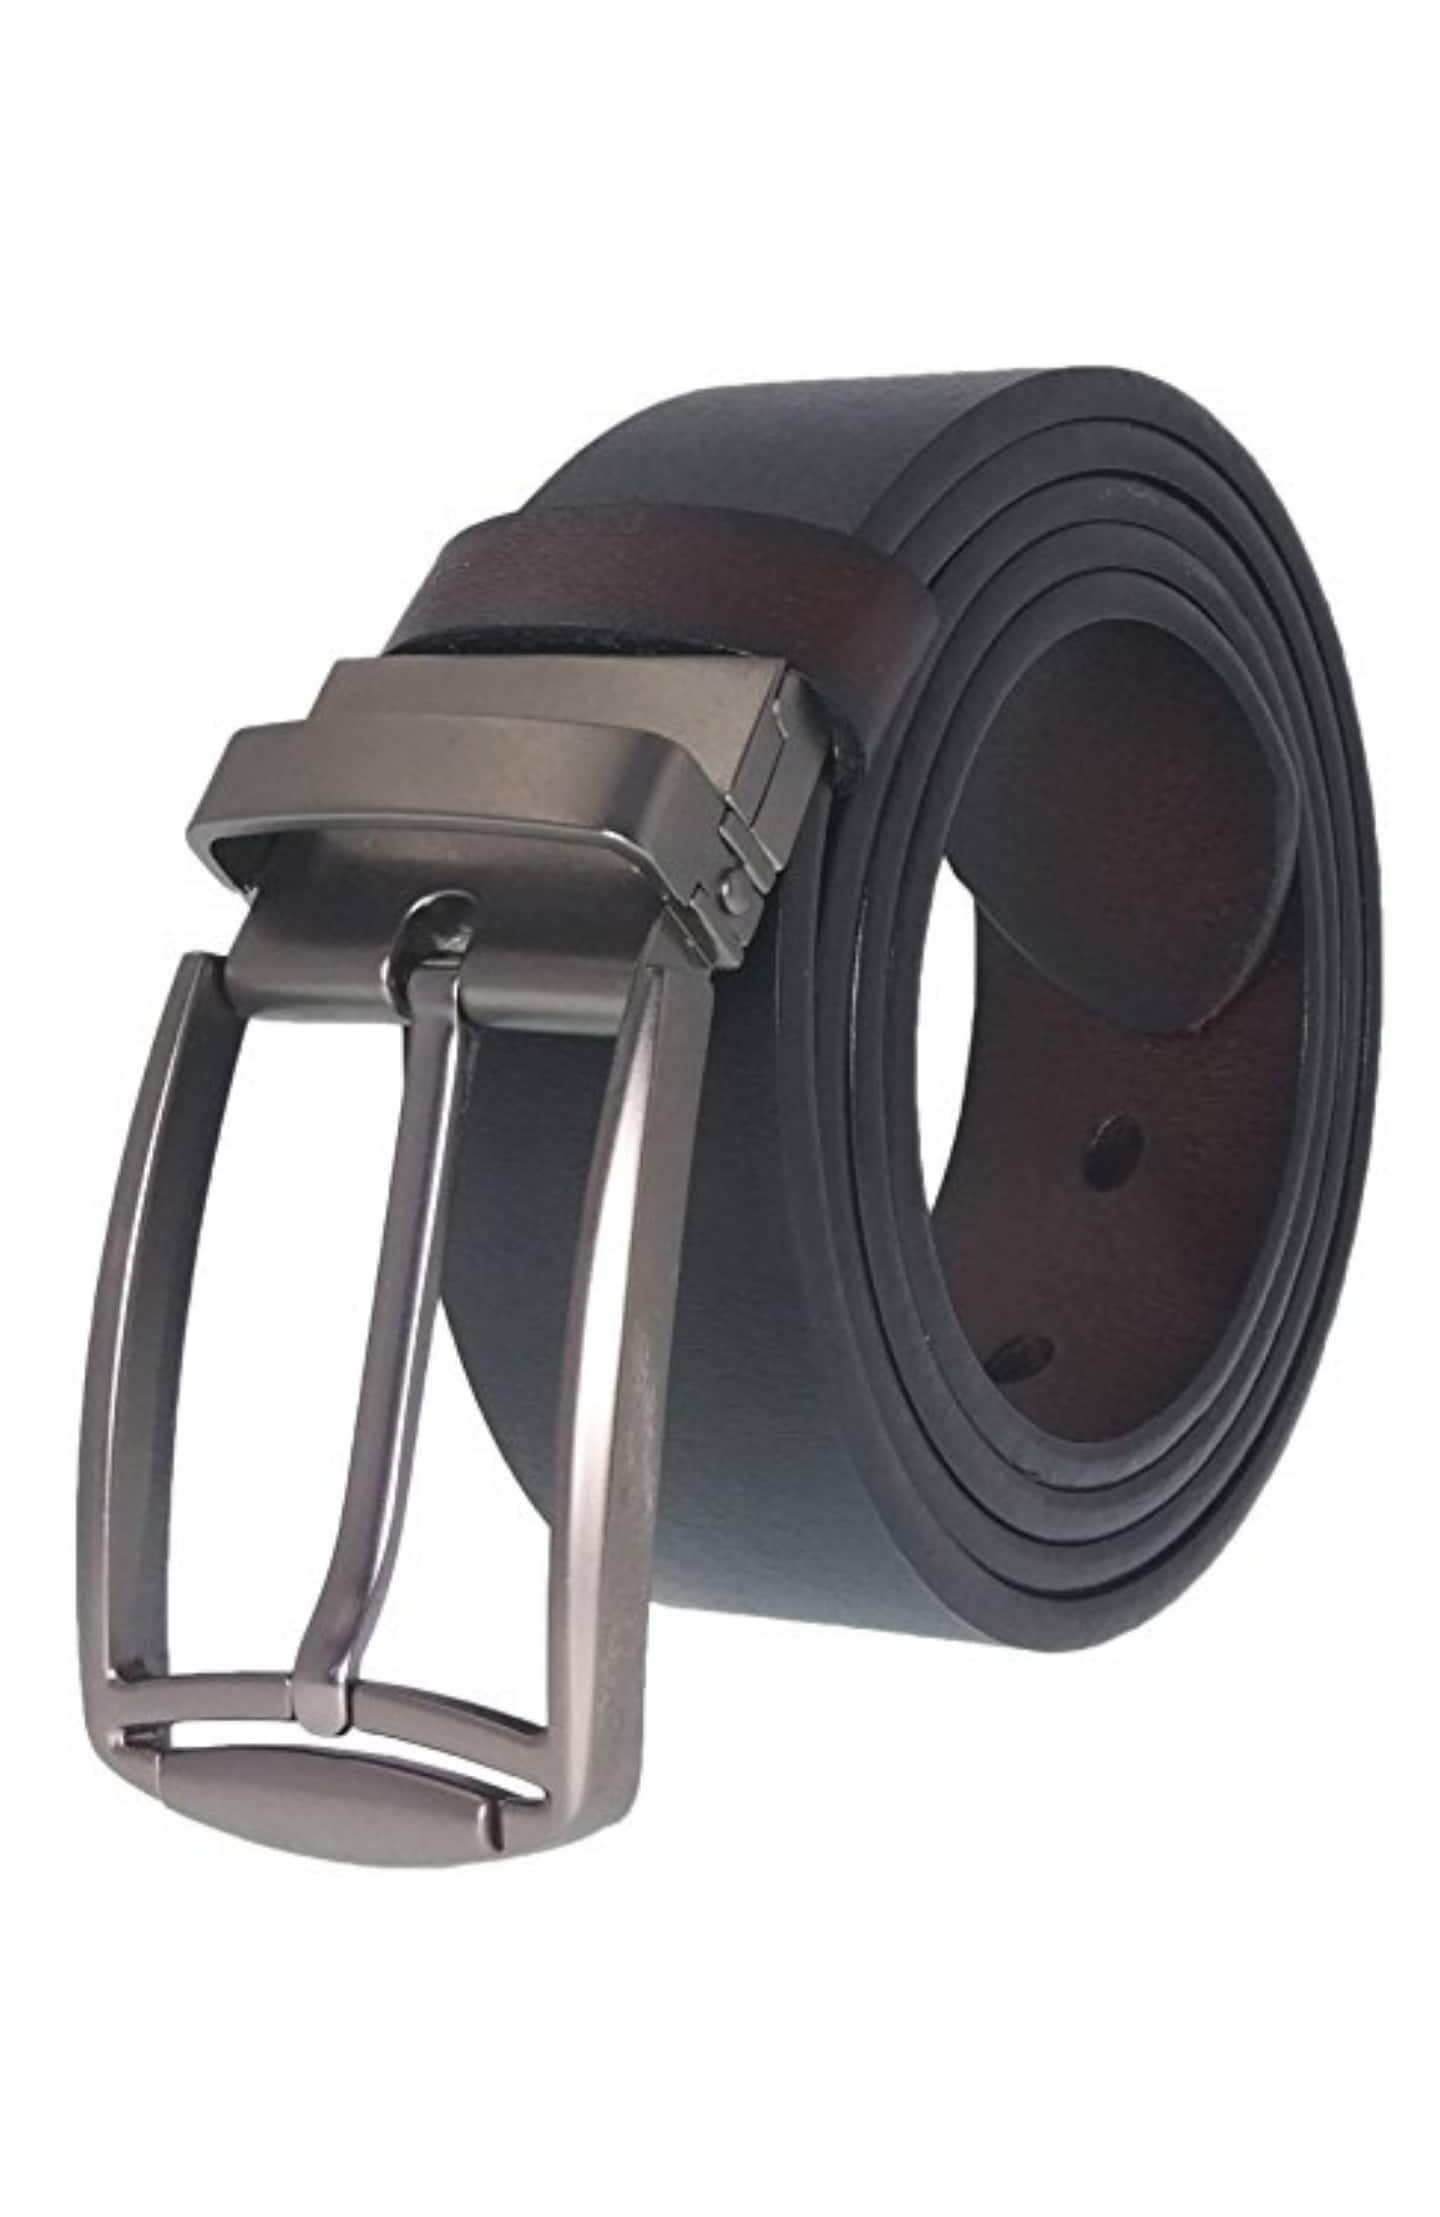 Grain leather reversible belt various styles $10 amazon prime